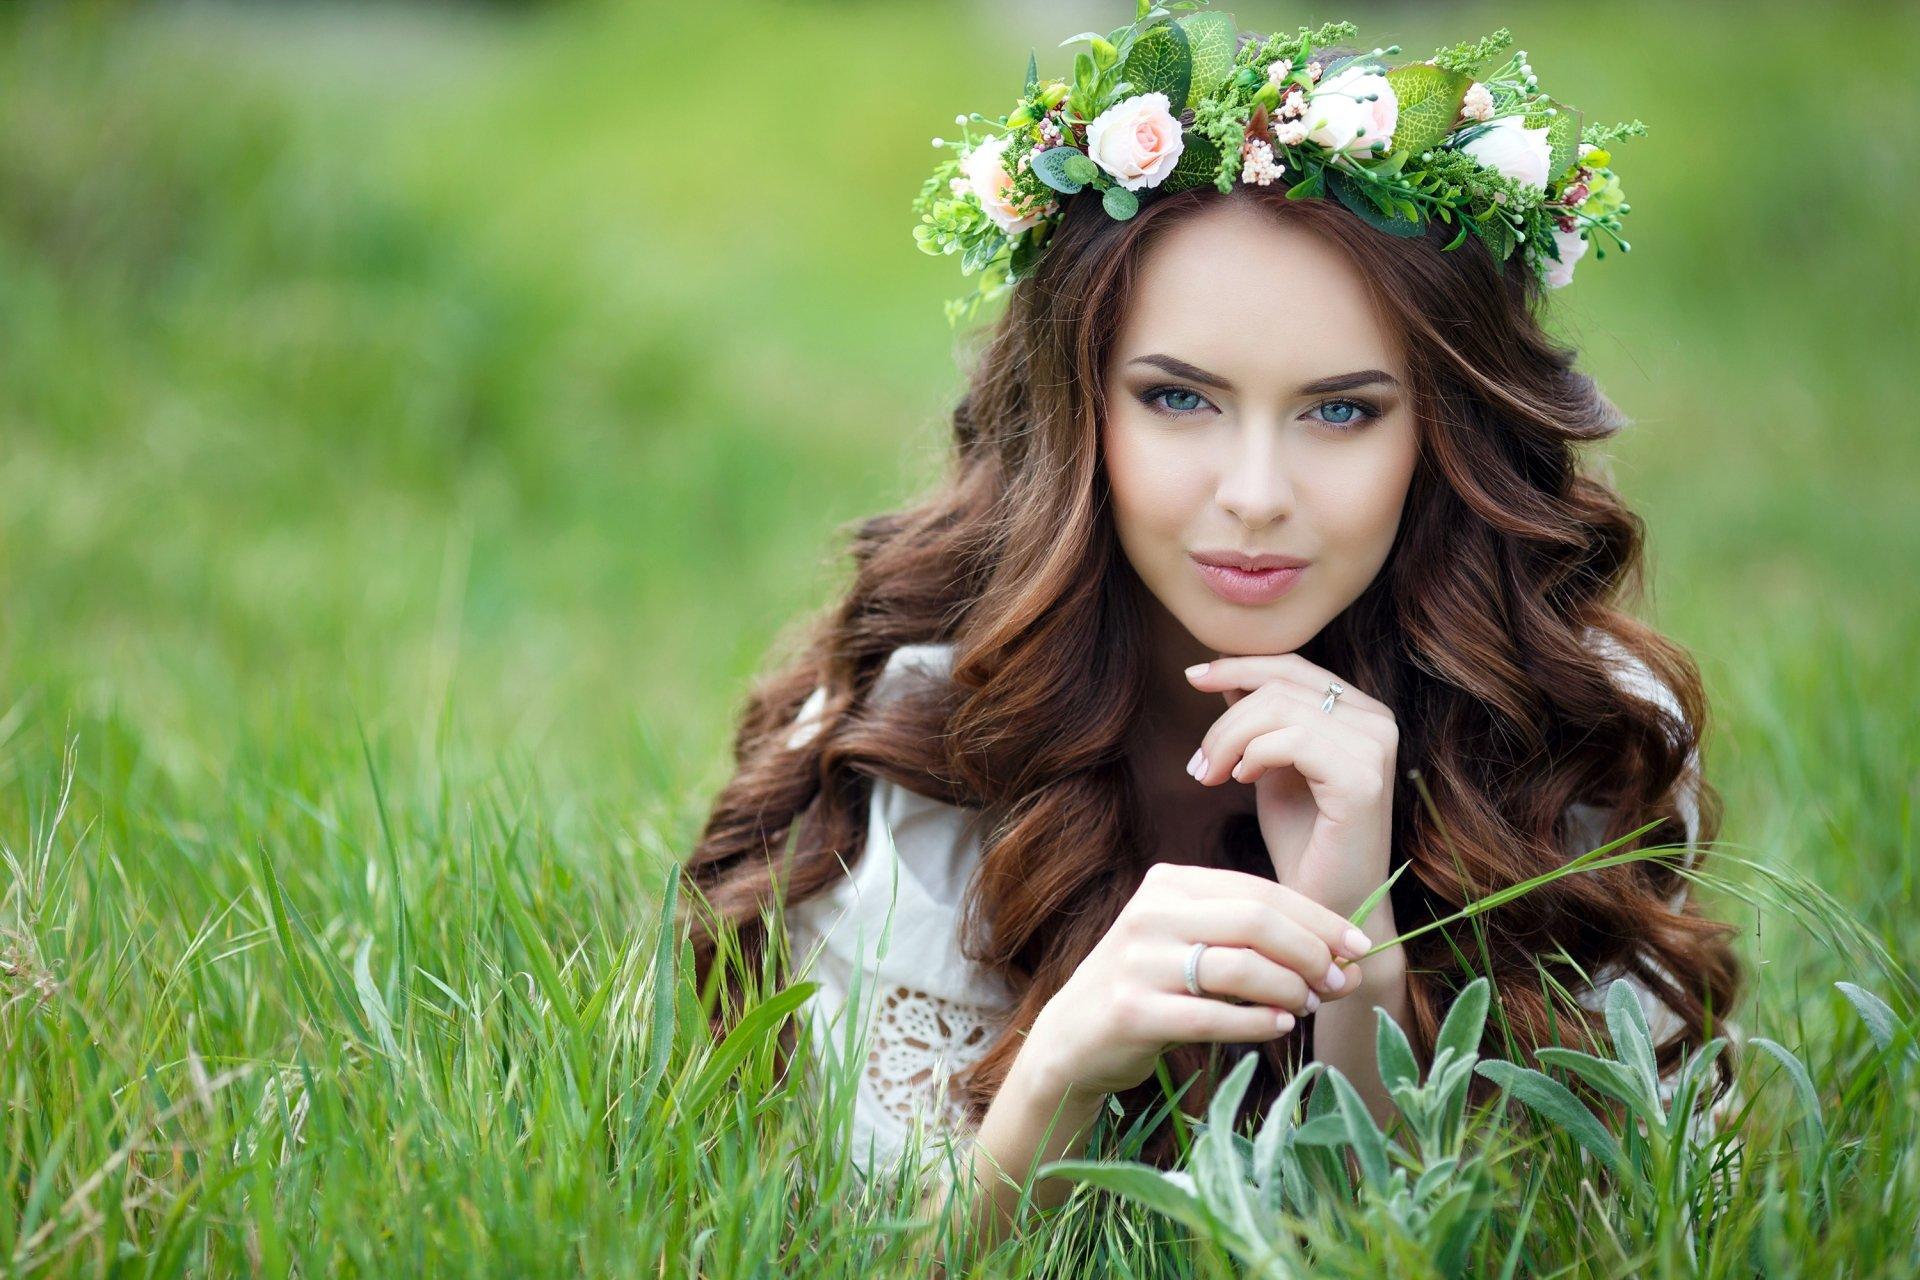 Women - Model  Woman Girl Brunette Wreath Grass Blue Eyes Wallpaper